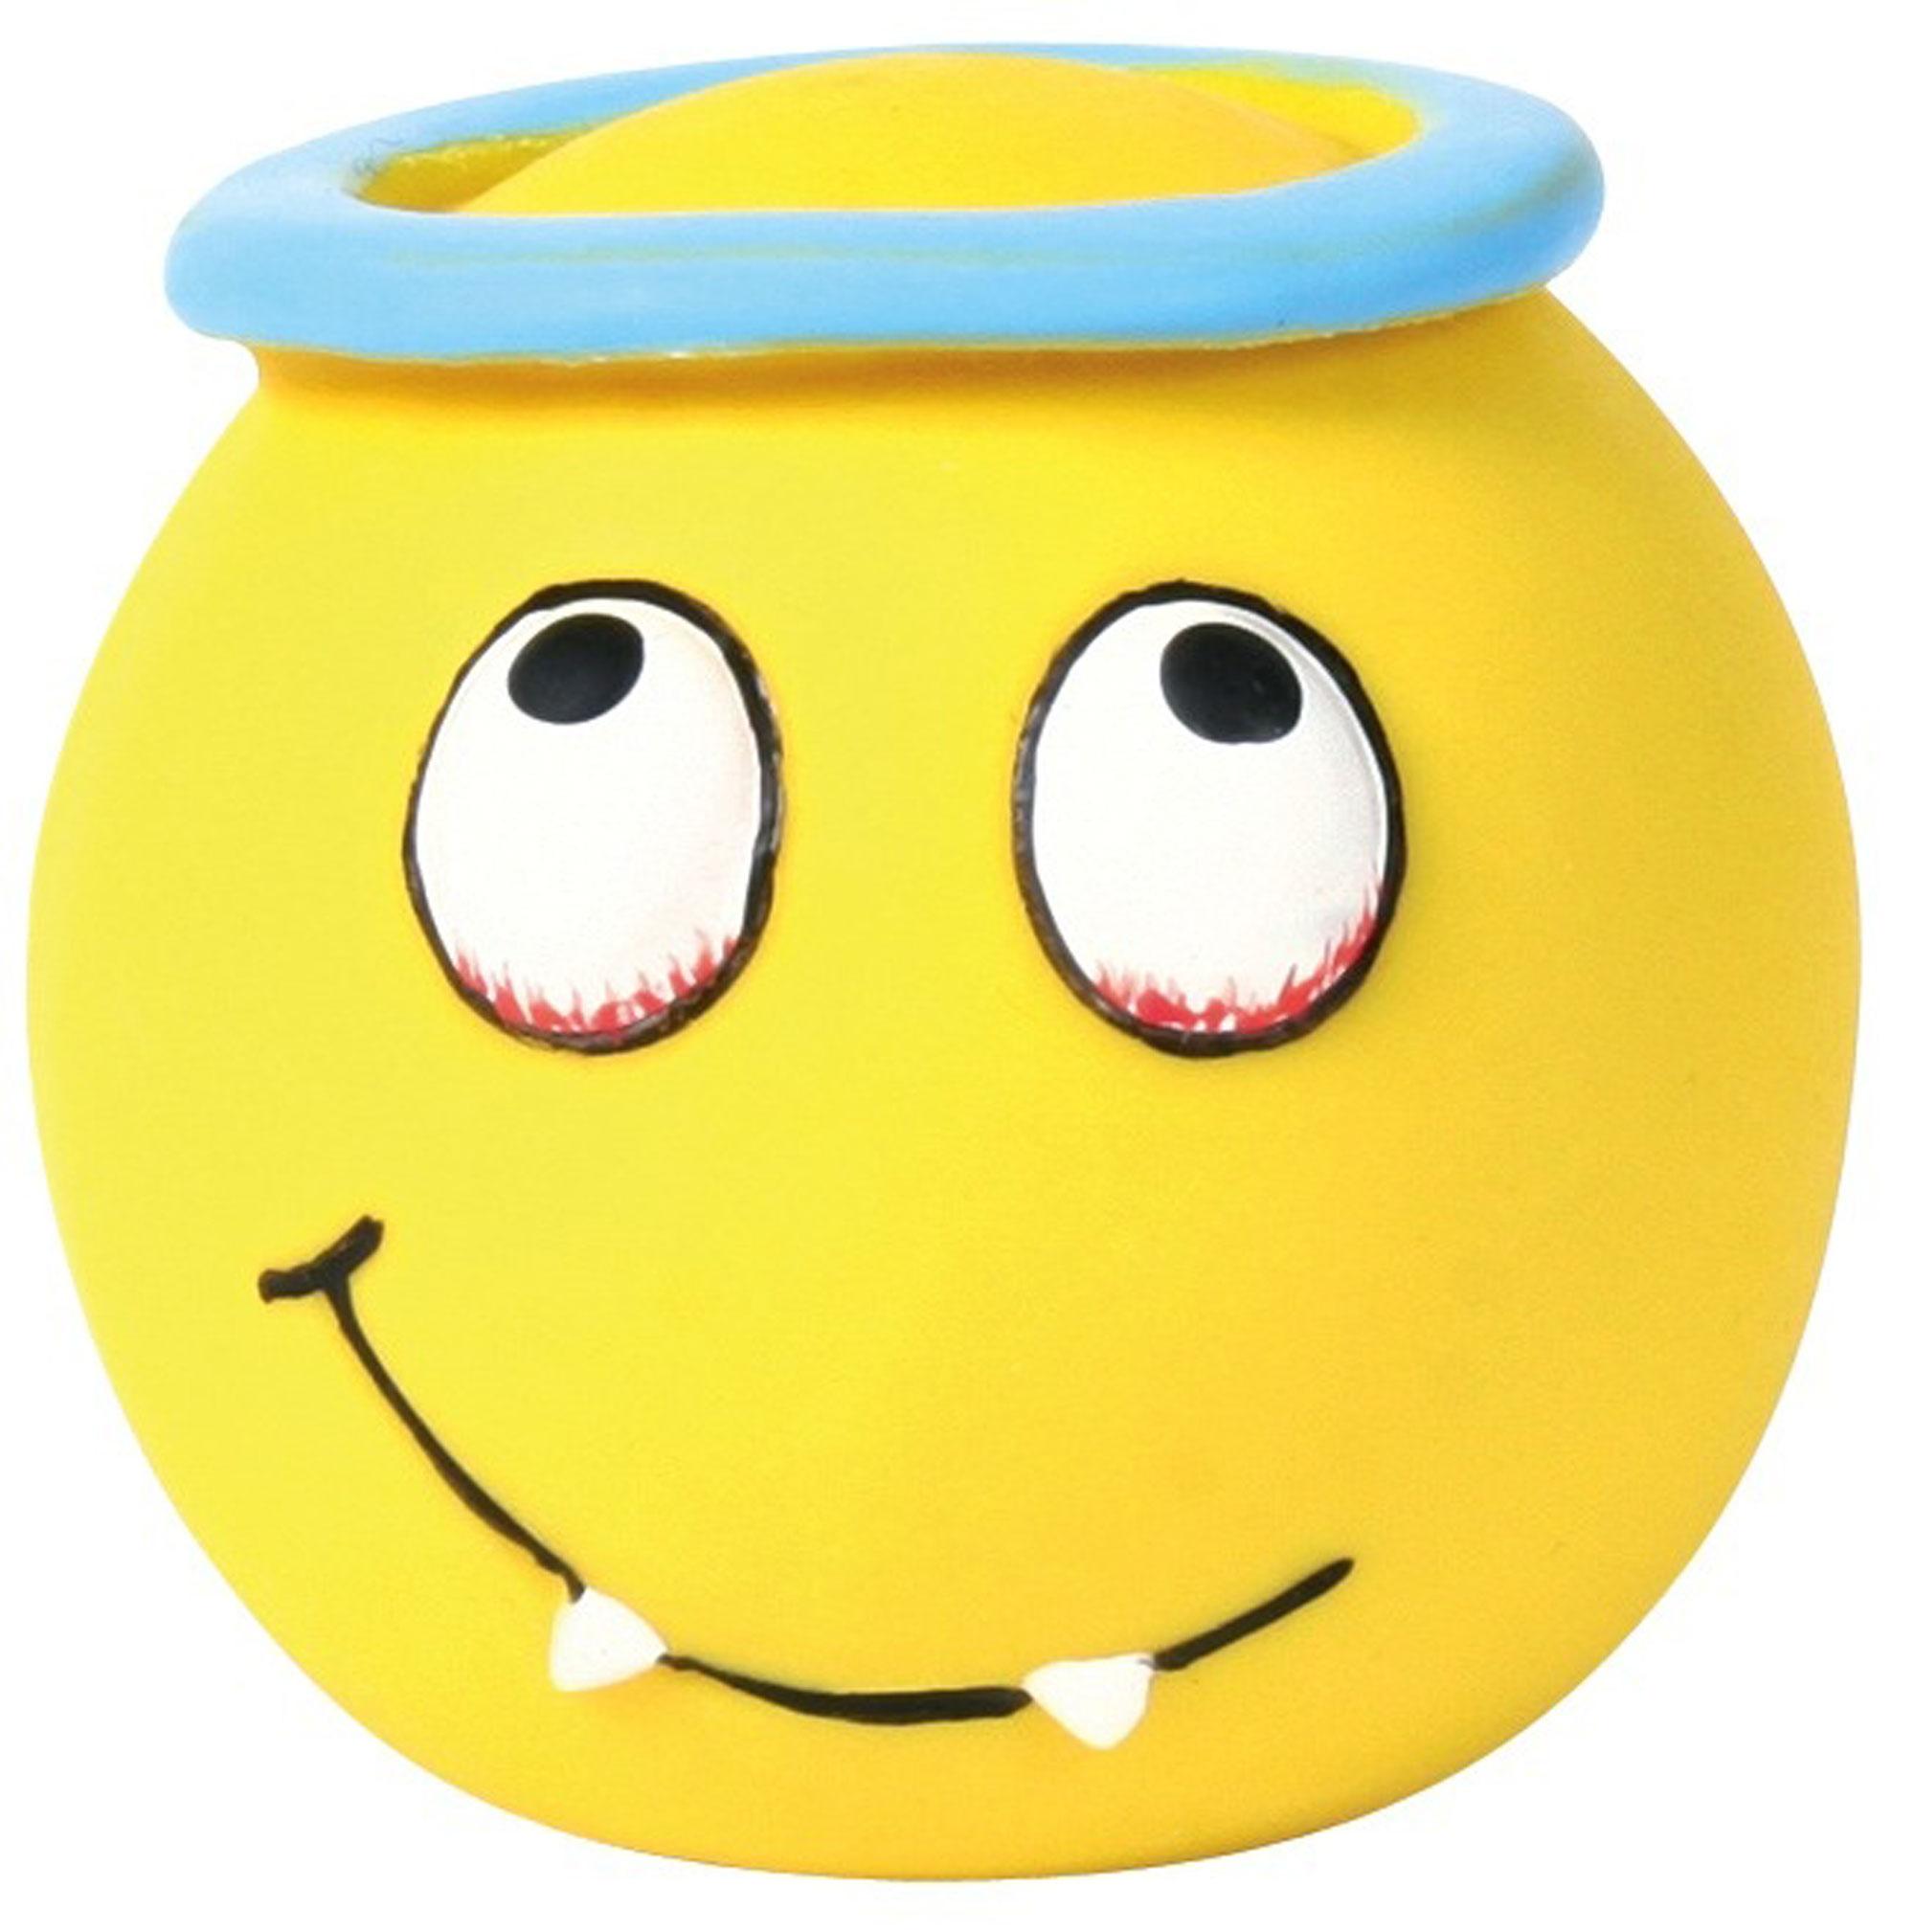 Hundespielzeug Ball Smiley Latex TRIXIE Ø 6 cm Bild 1